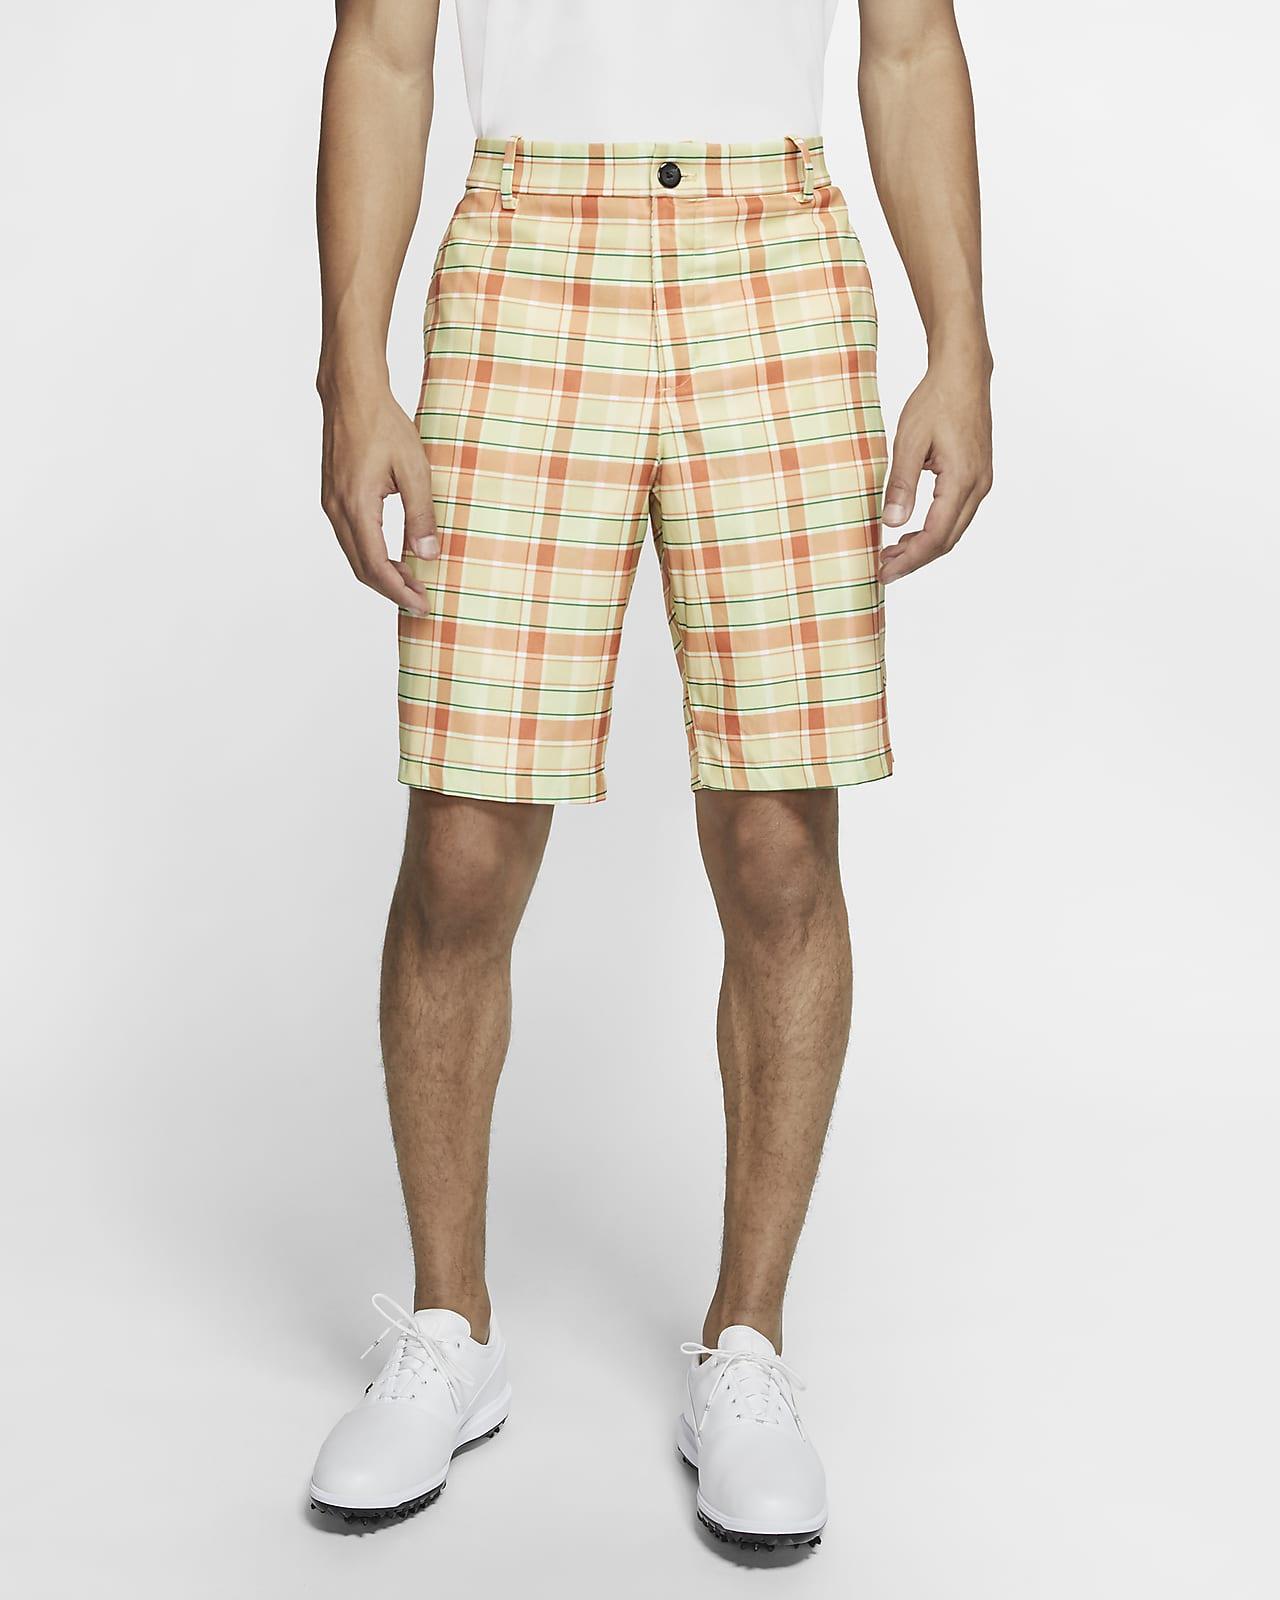 Nike Flex Men's Checked Golf Shorts